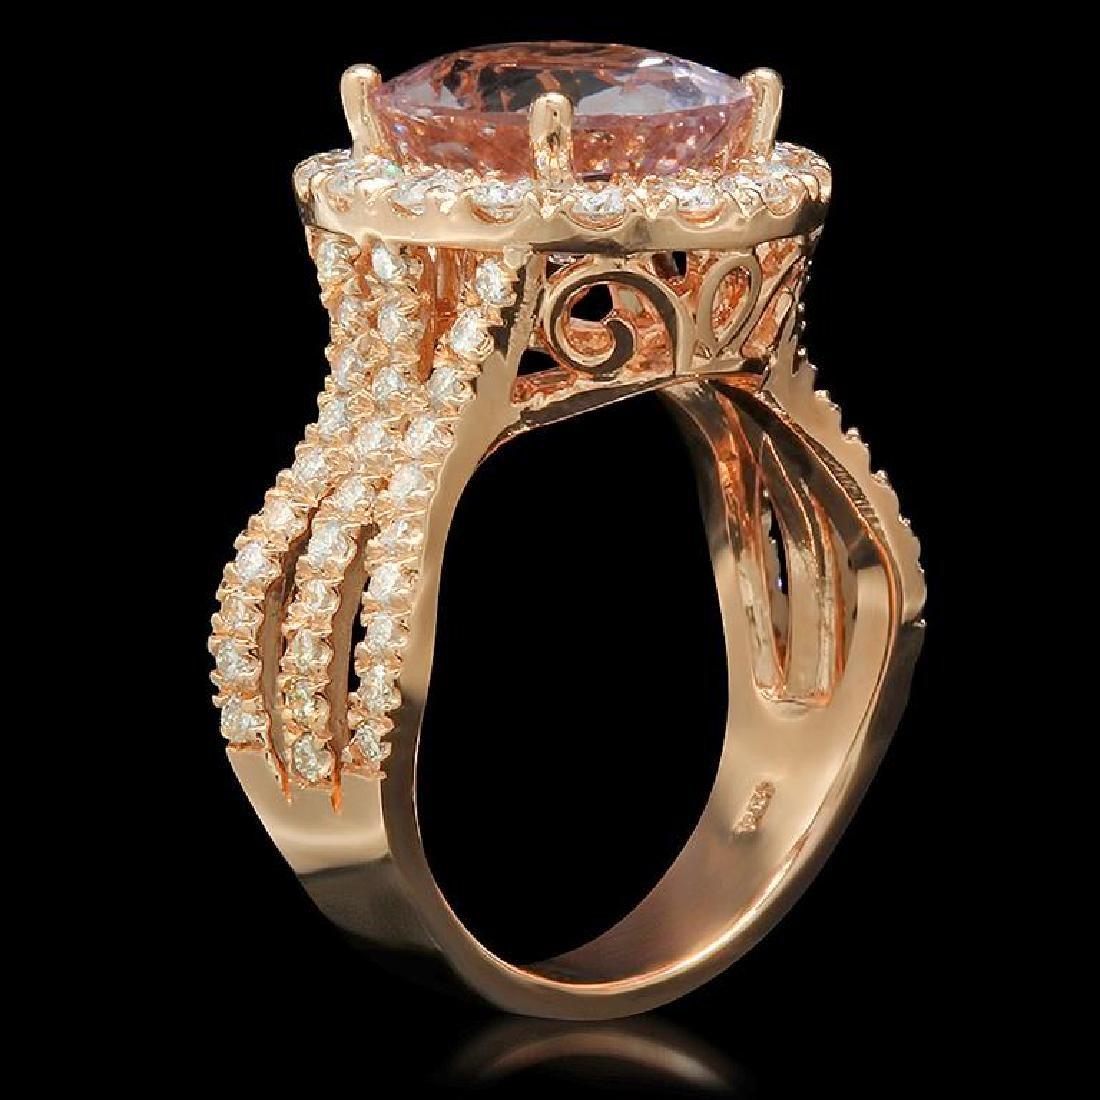 14K Gold 8.3ct Morganite 1.40ct Diamond Ring - 2